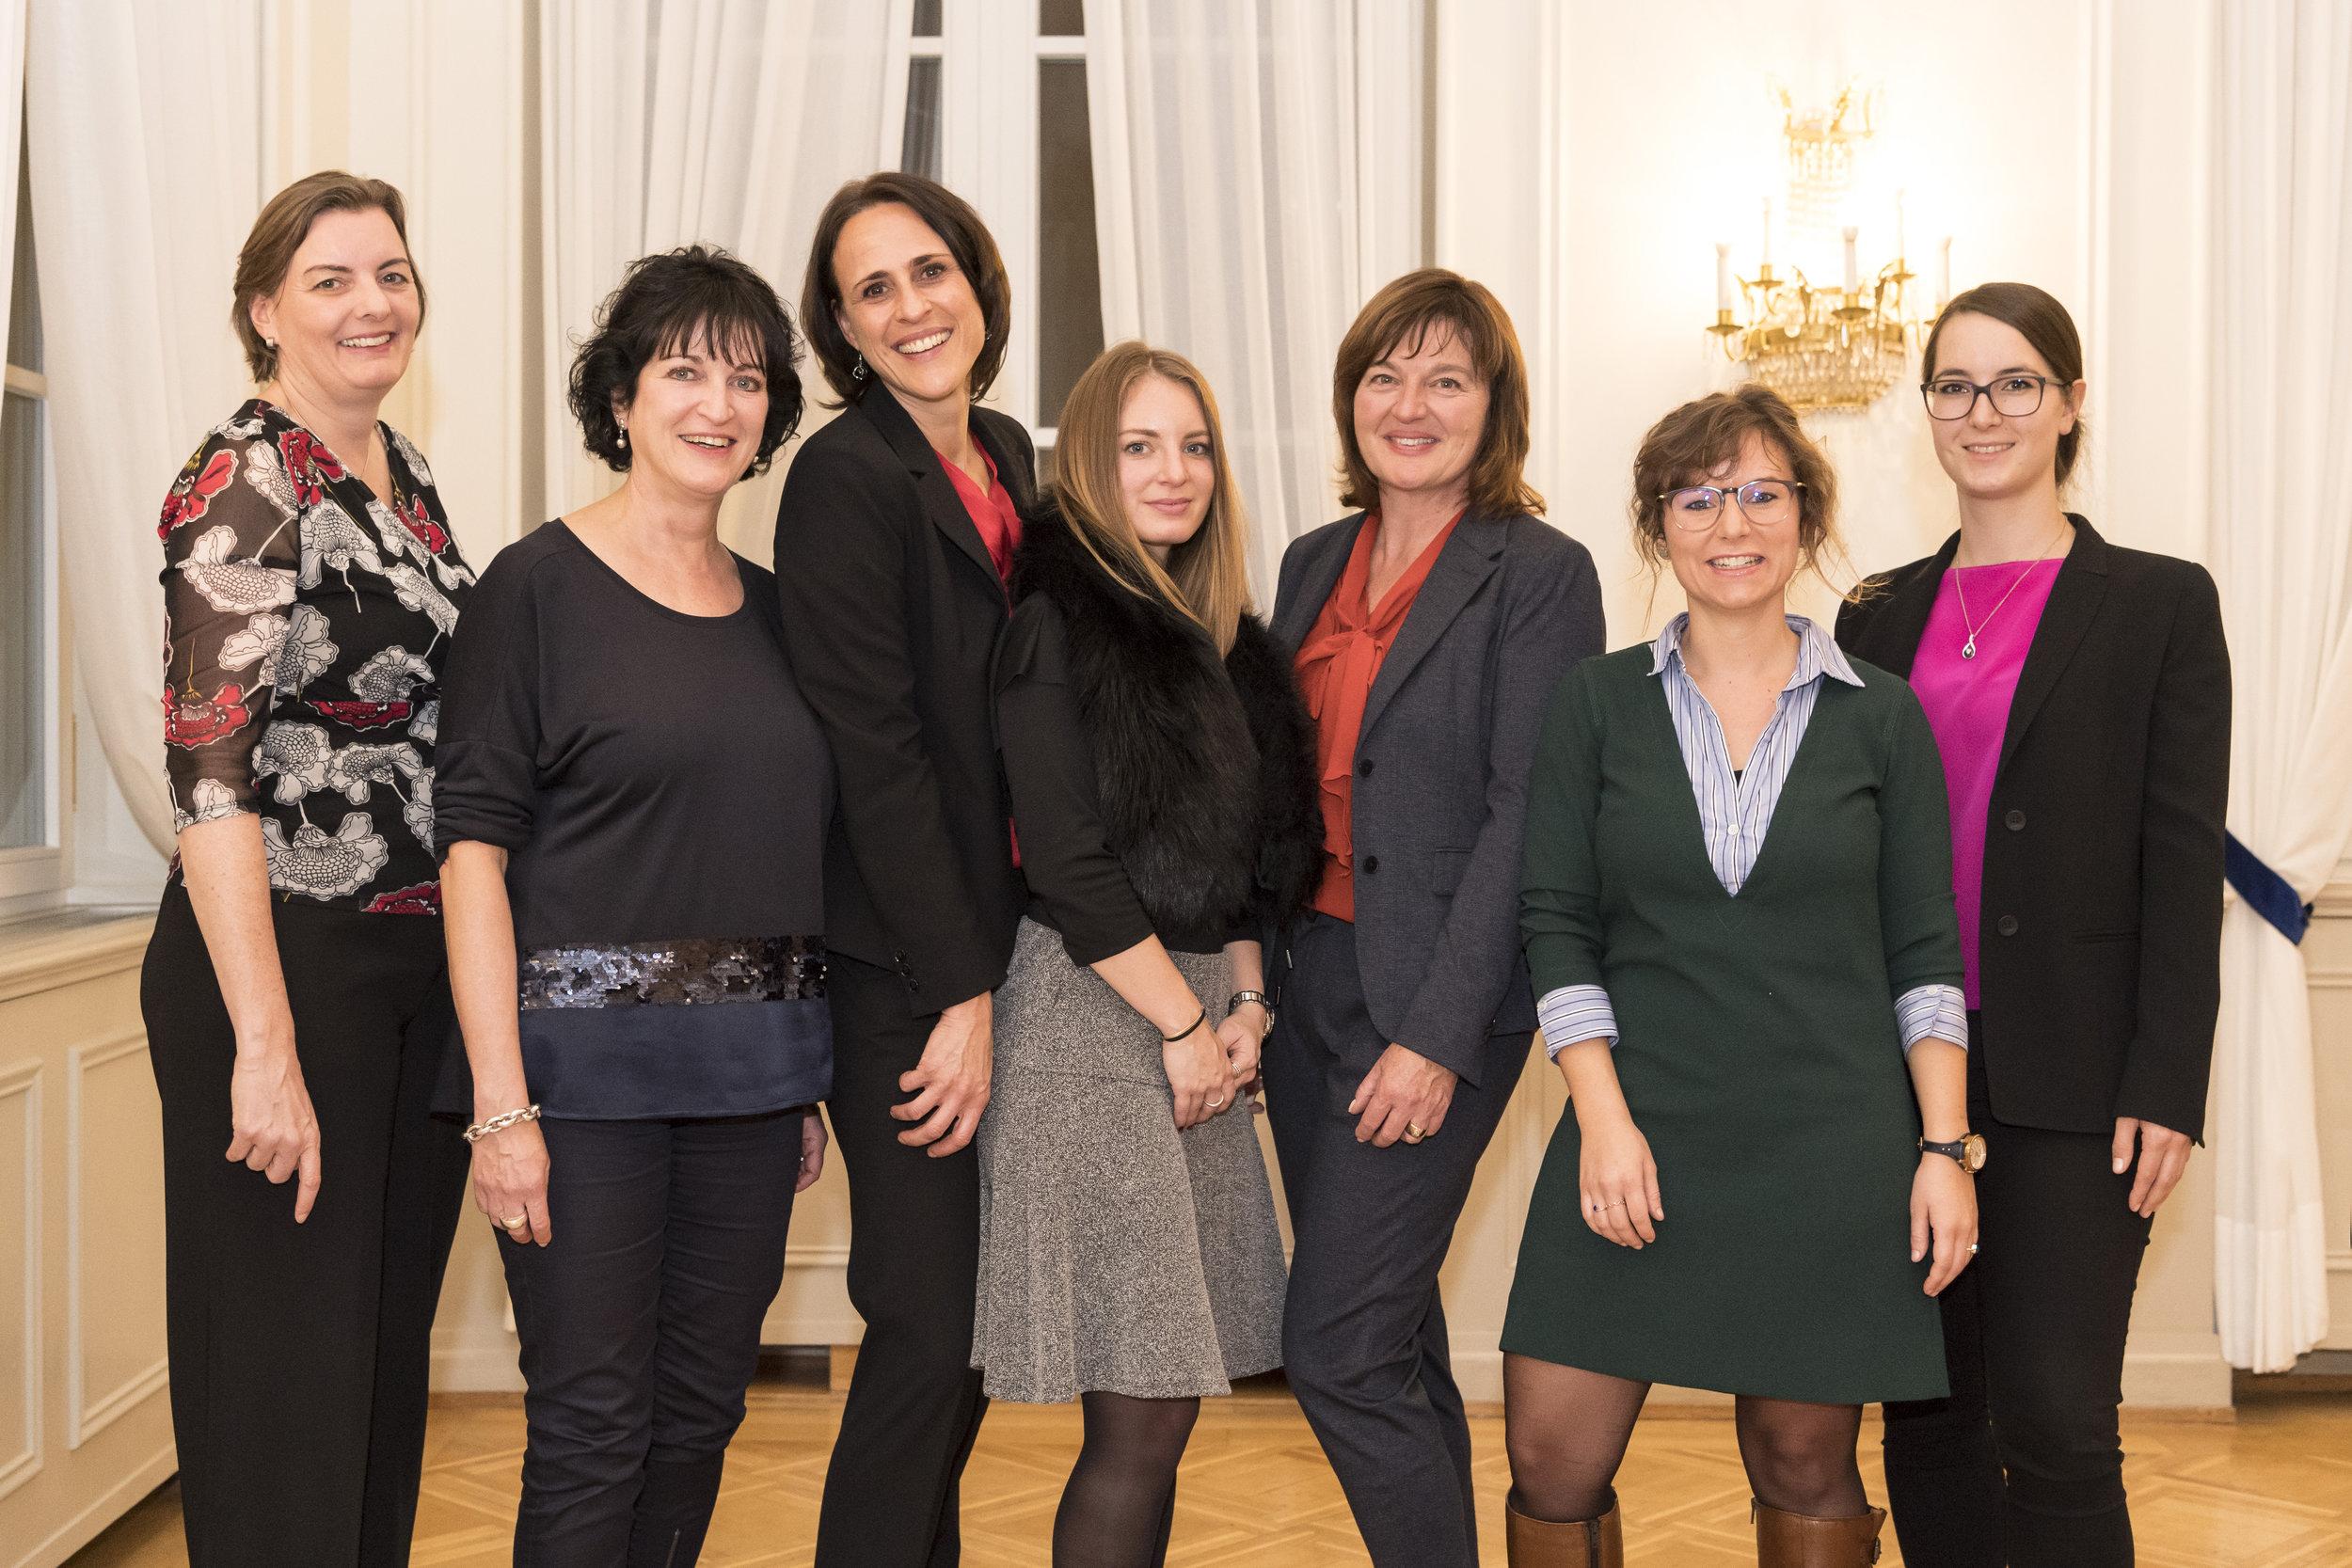 Das womenmatters-Kernteam: Gaby Köhli, Charlotte Trinler, Christine Wittmer, Stefanie Fehr, Karin Giacomuzzi, Marilen Dürr und Patricia Büeler (v.l.n.r.)